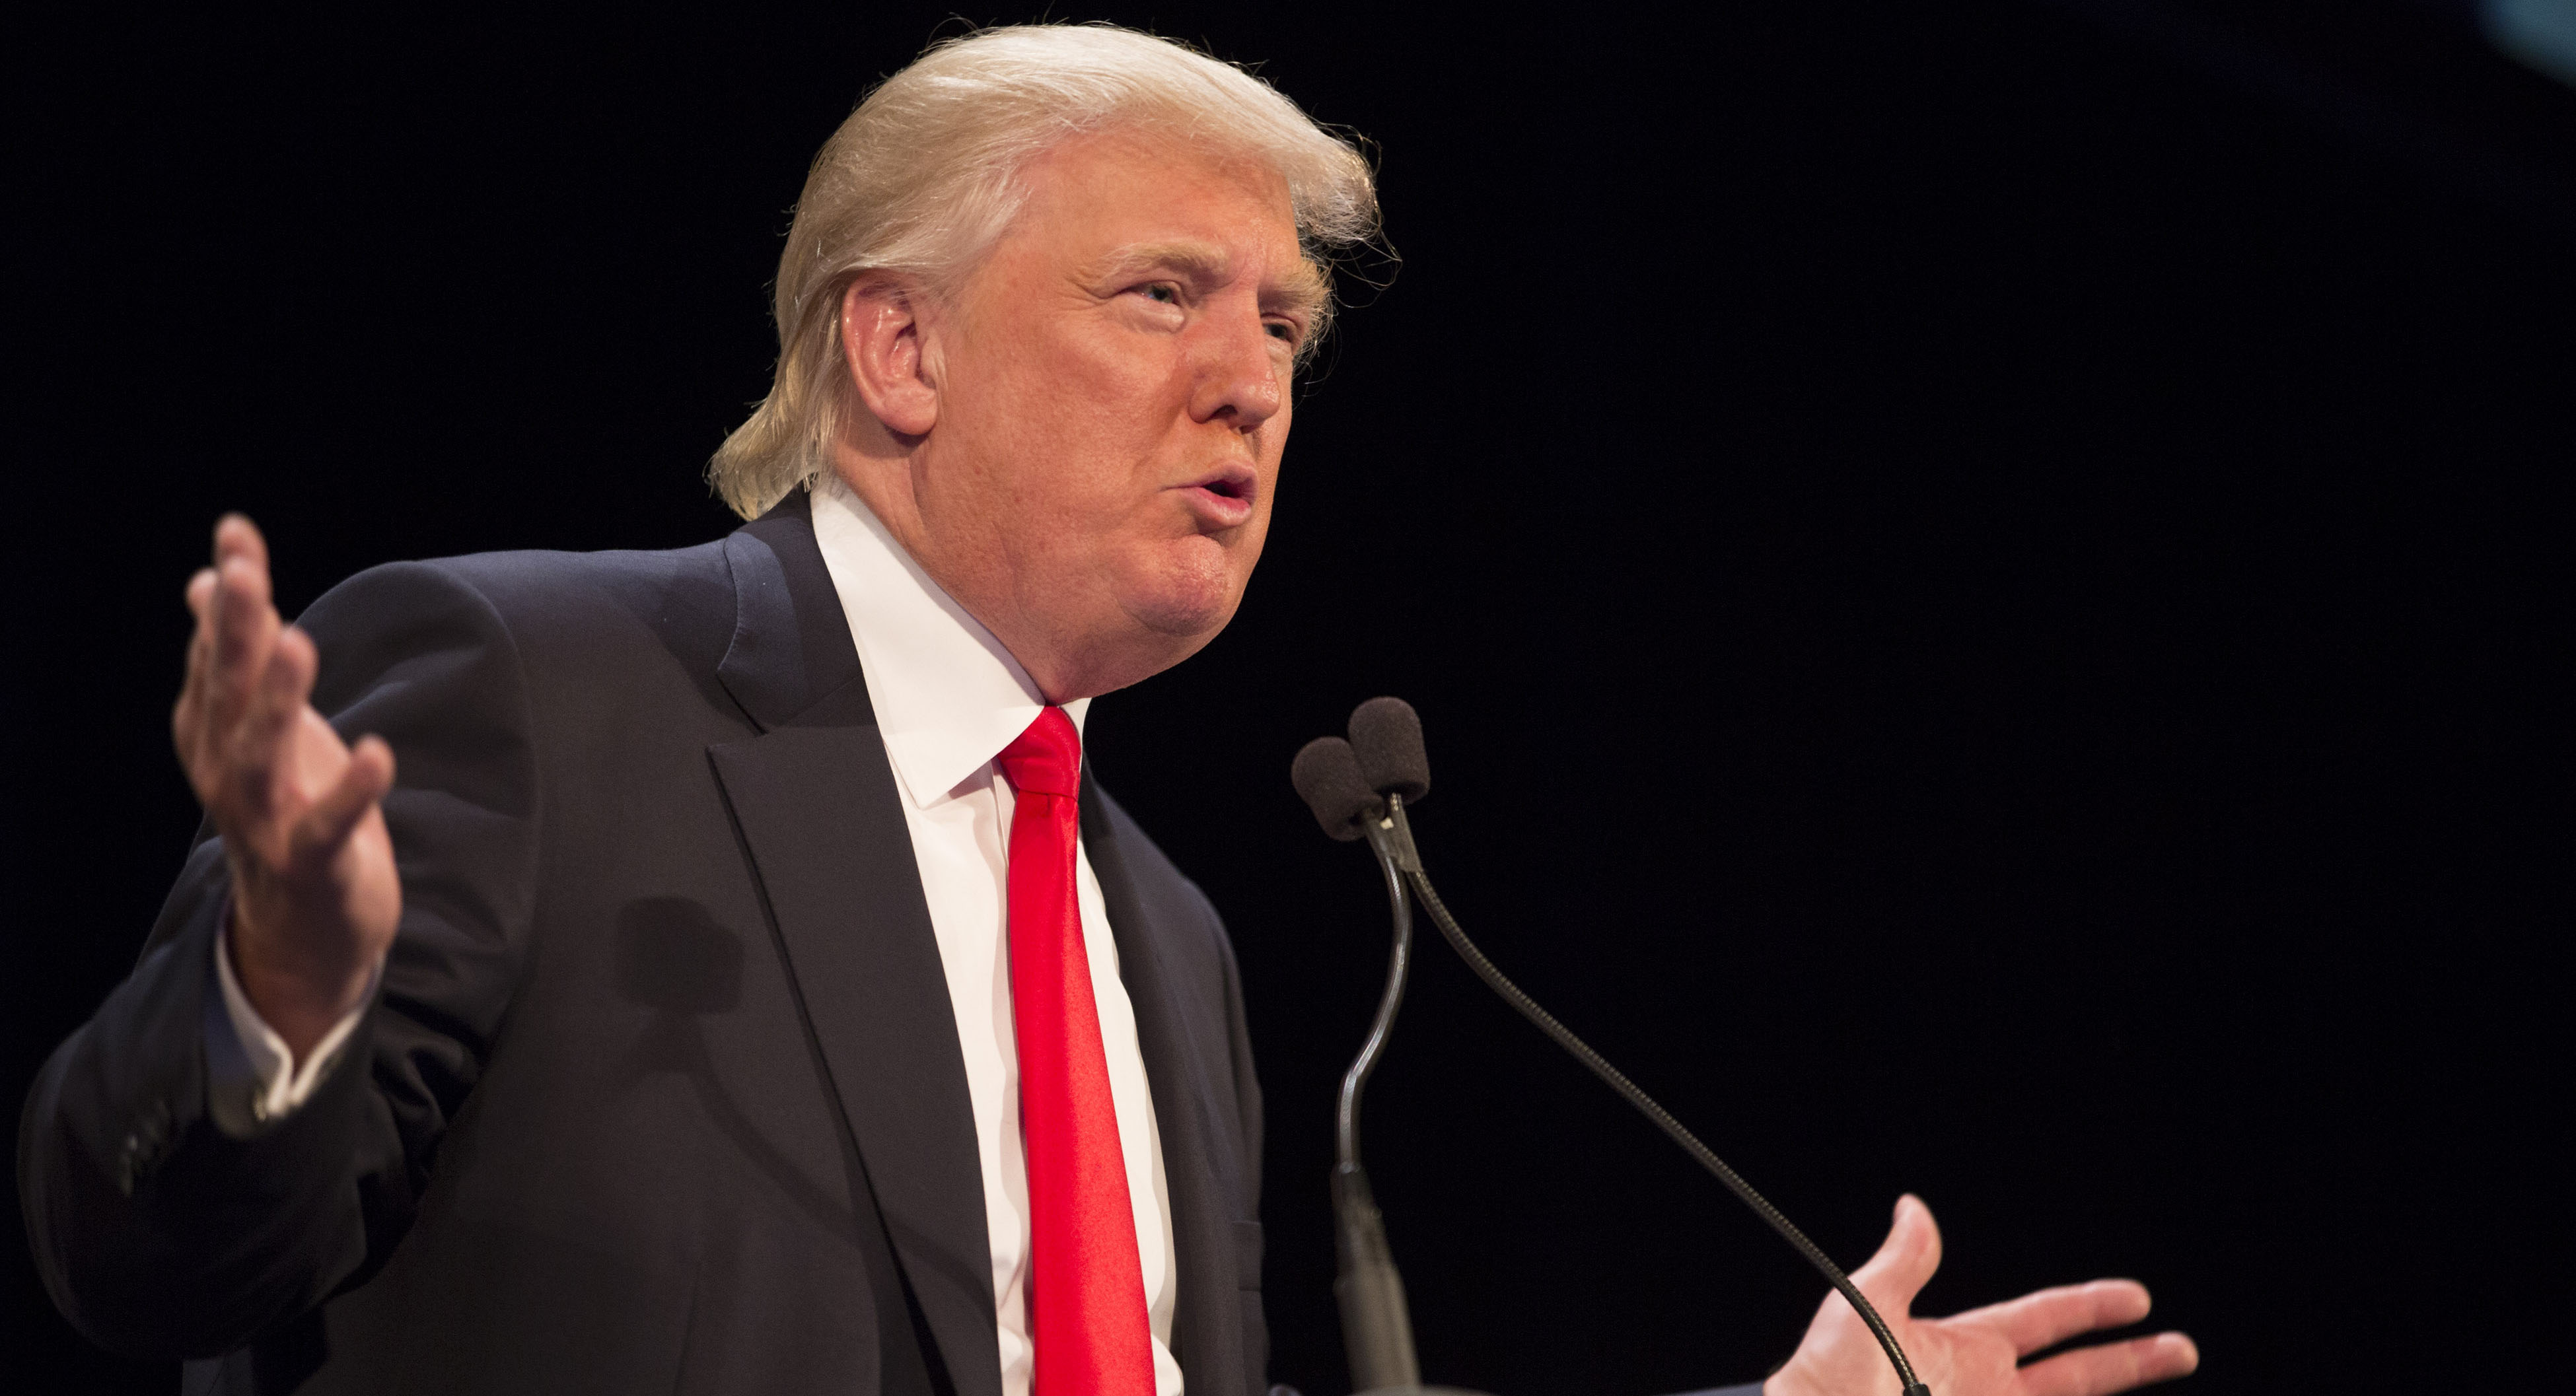 Le monde serait meilleur avec Saddam Hussein et Kadhafi, selon Donald Trump